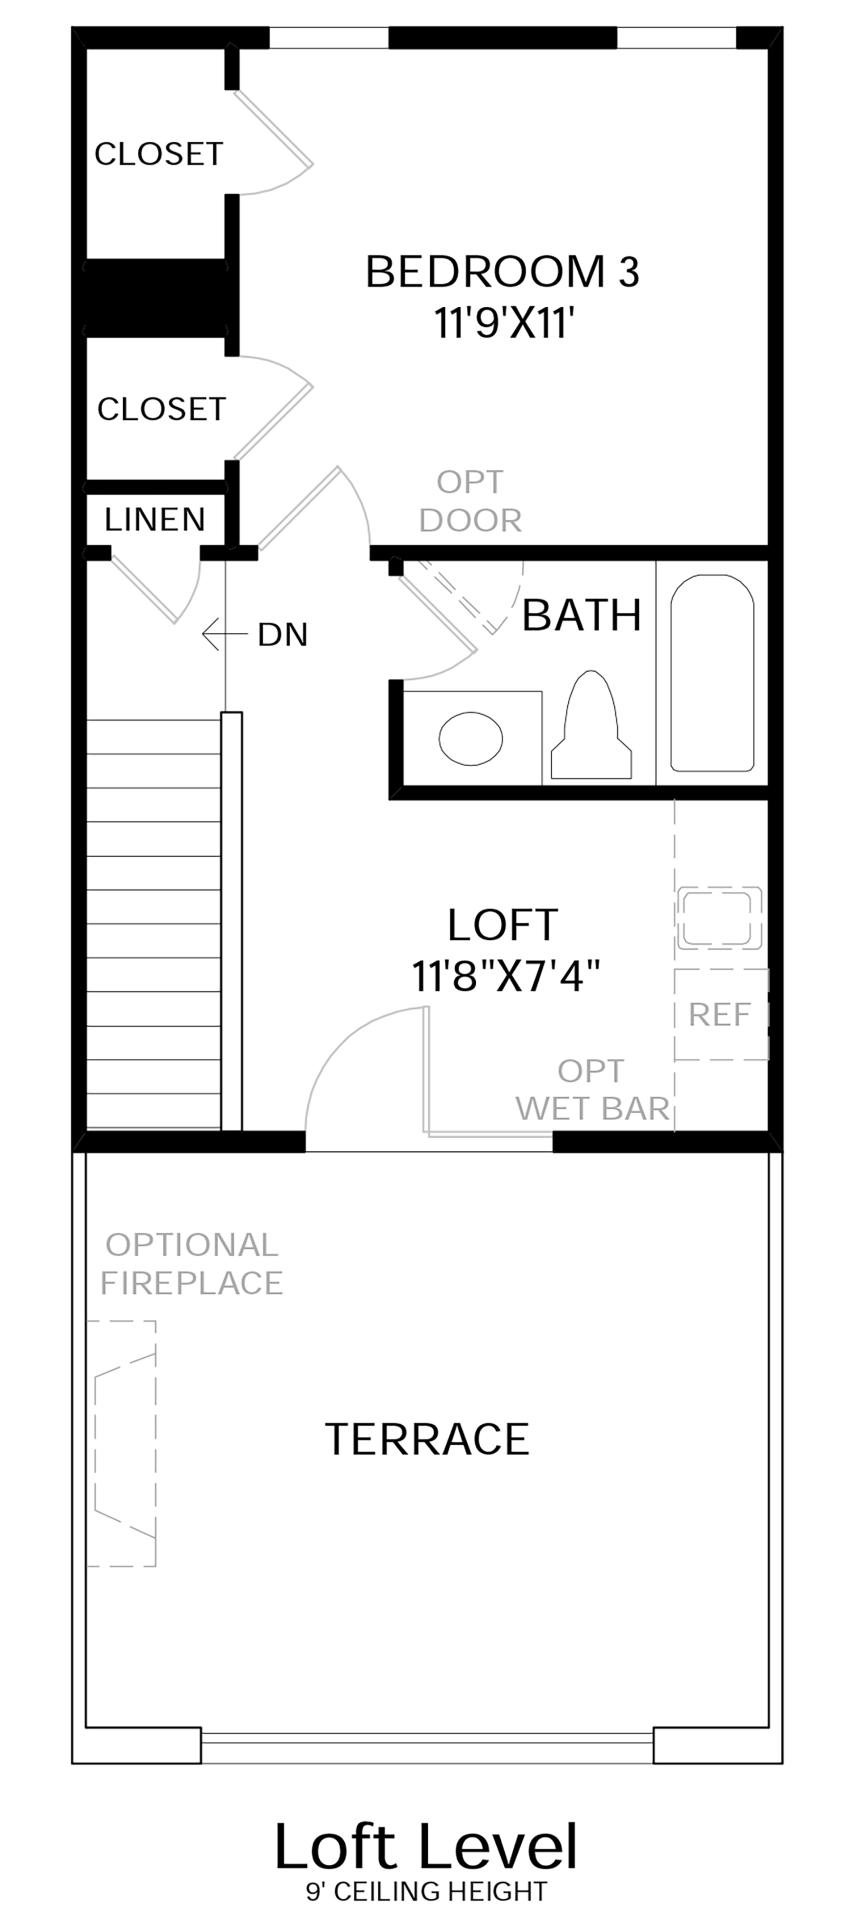 Loft Level Floor Plan